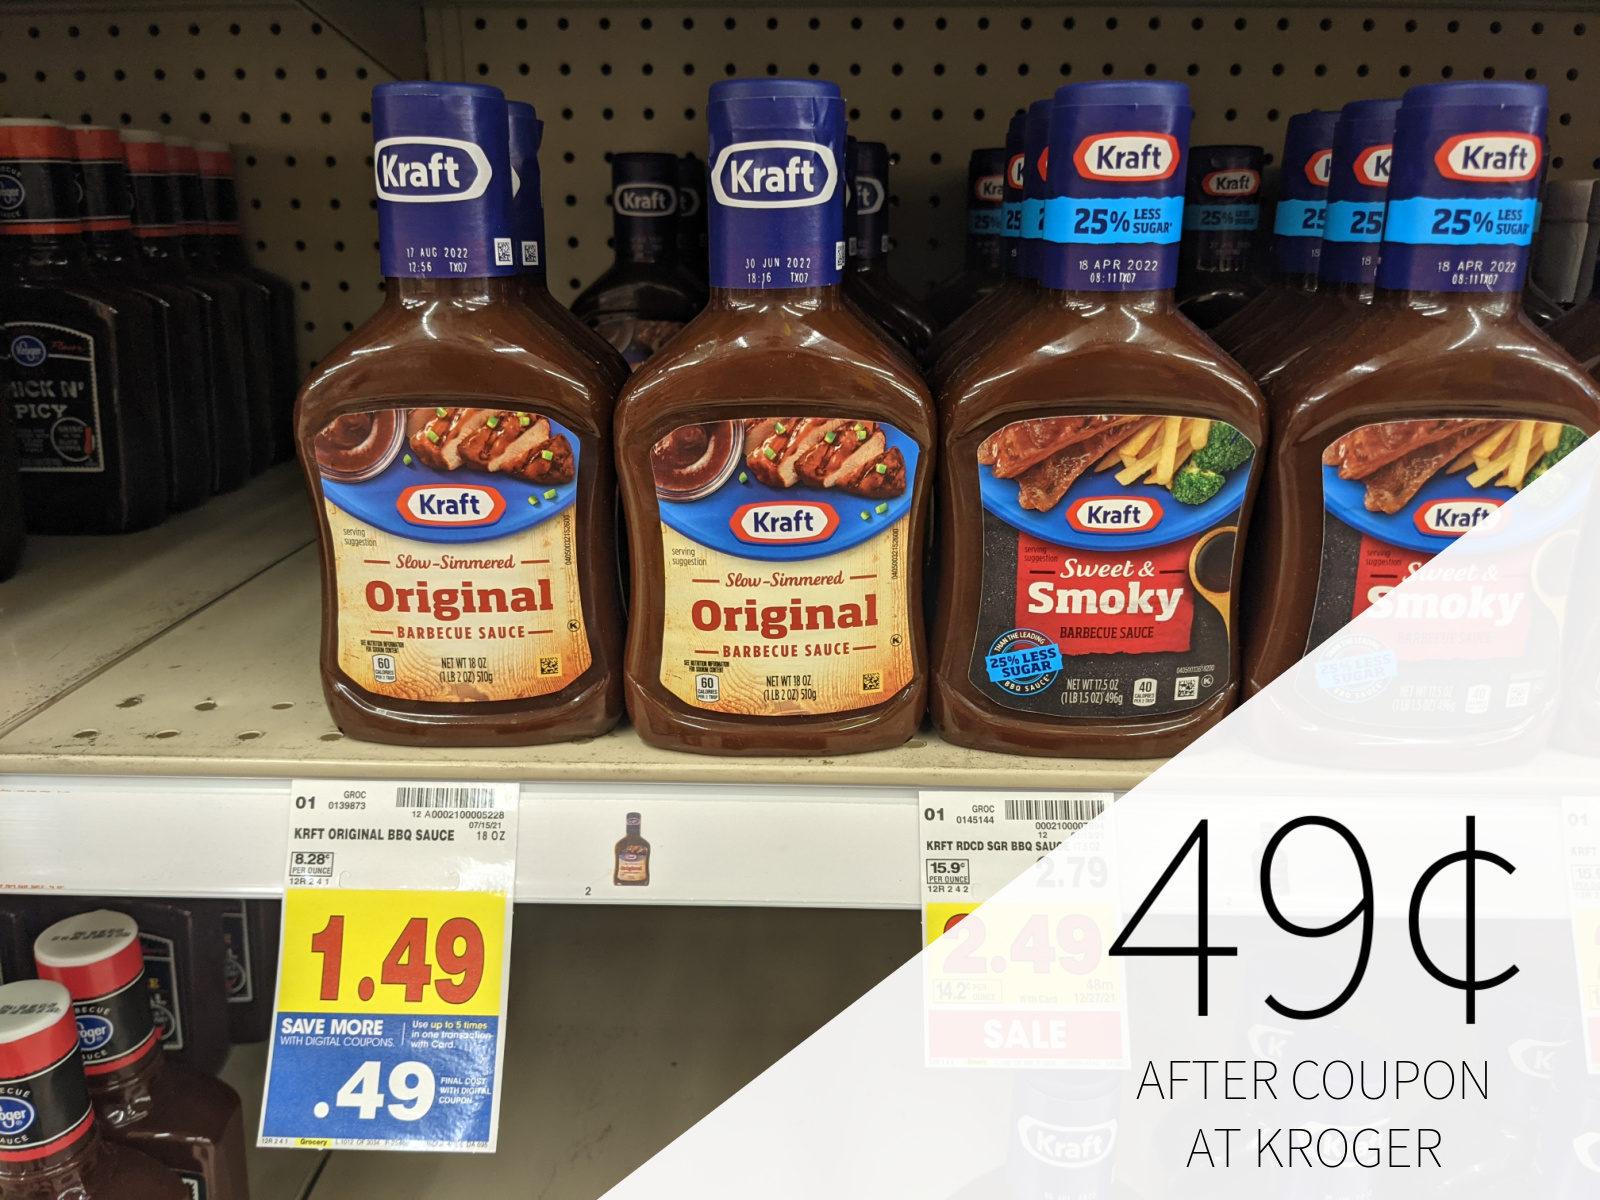 Kraft Barbecue Sauce Just 49¢ At Kroger